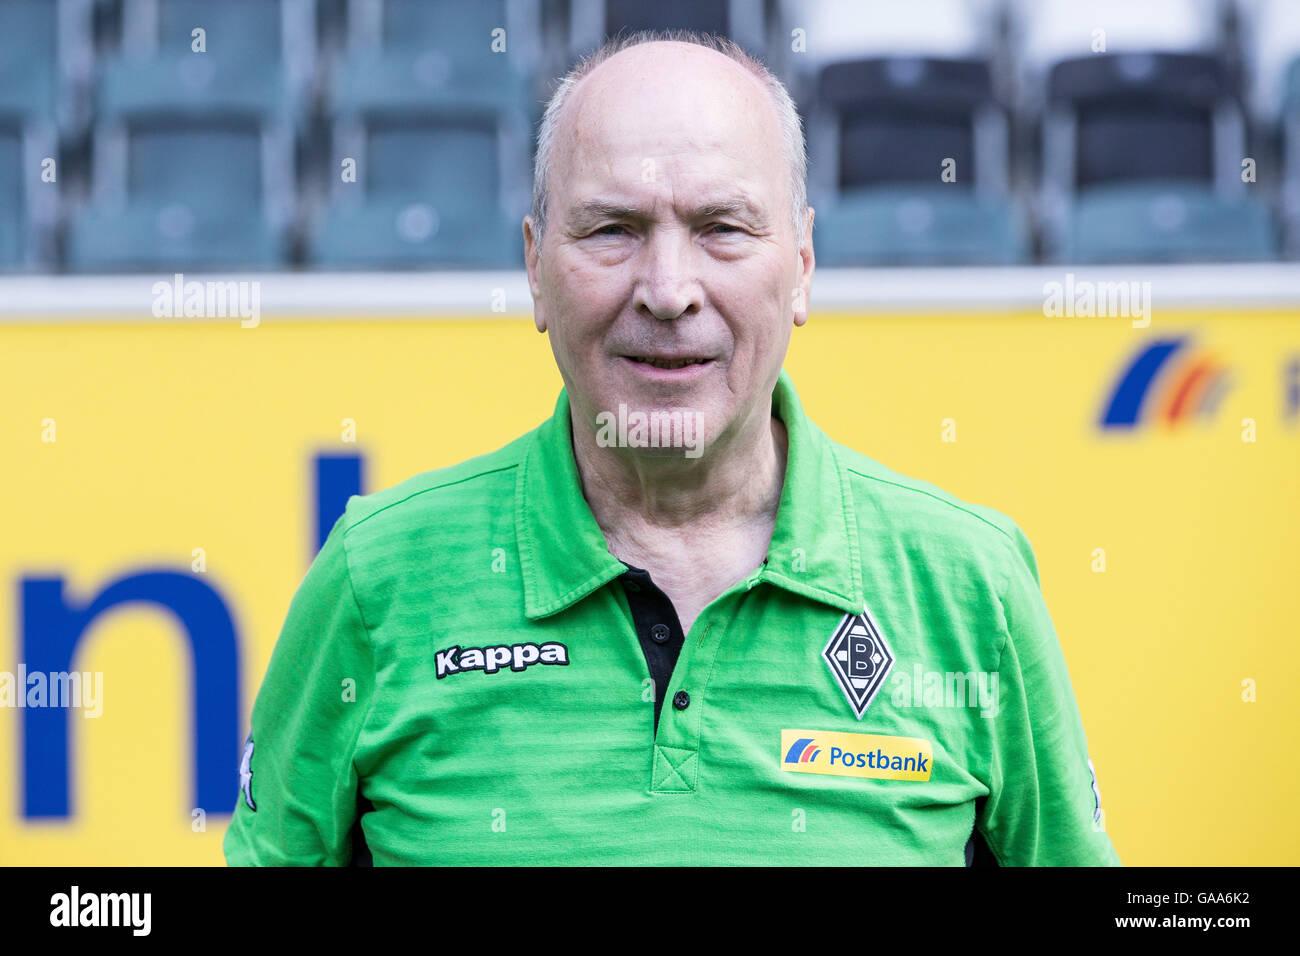 German Bundesliga - Season 2016/17 - Photocall Borussia Moenchengladbach on 1 August 2016 in Moenchengladbach, Germany: - Stock Image